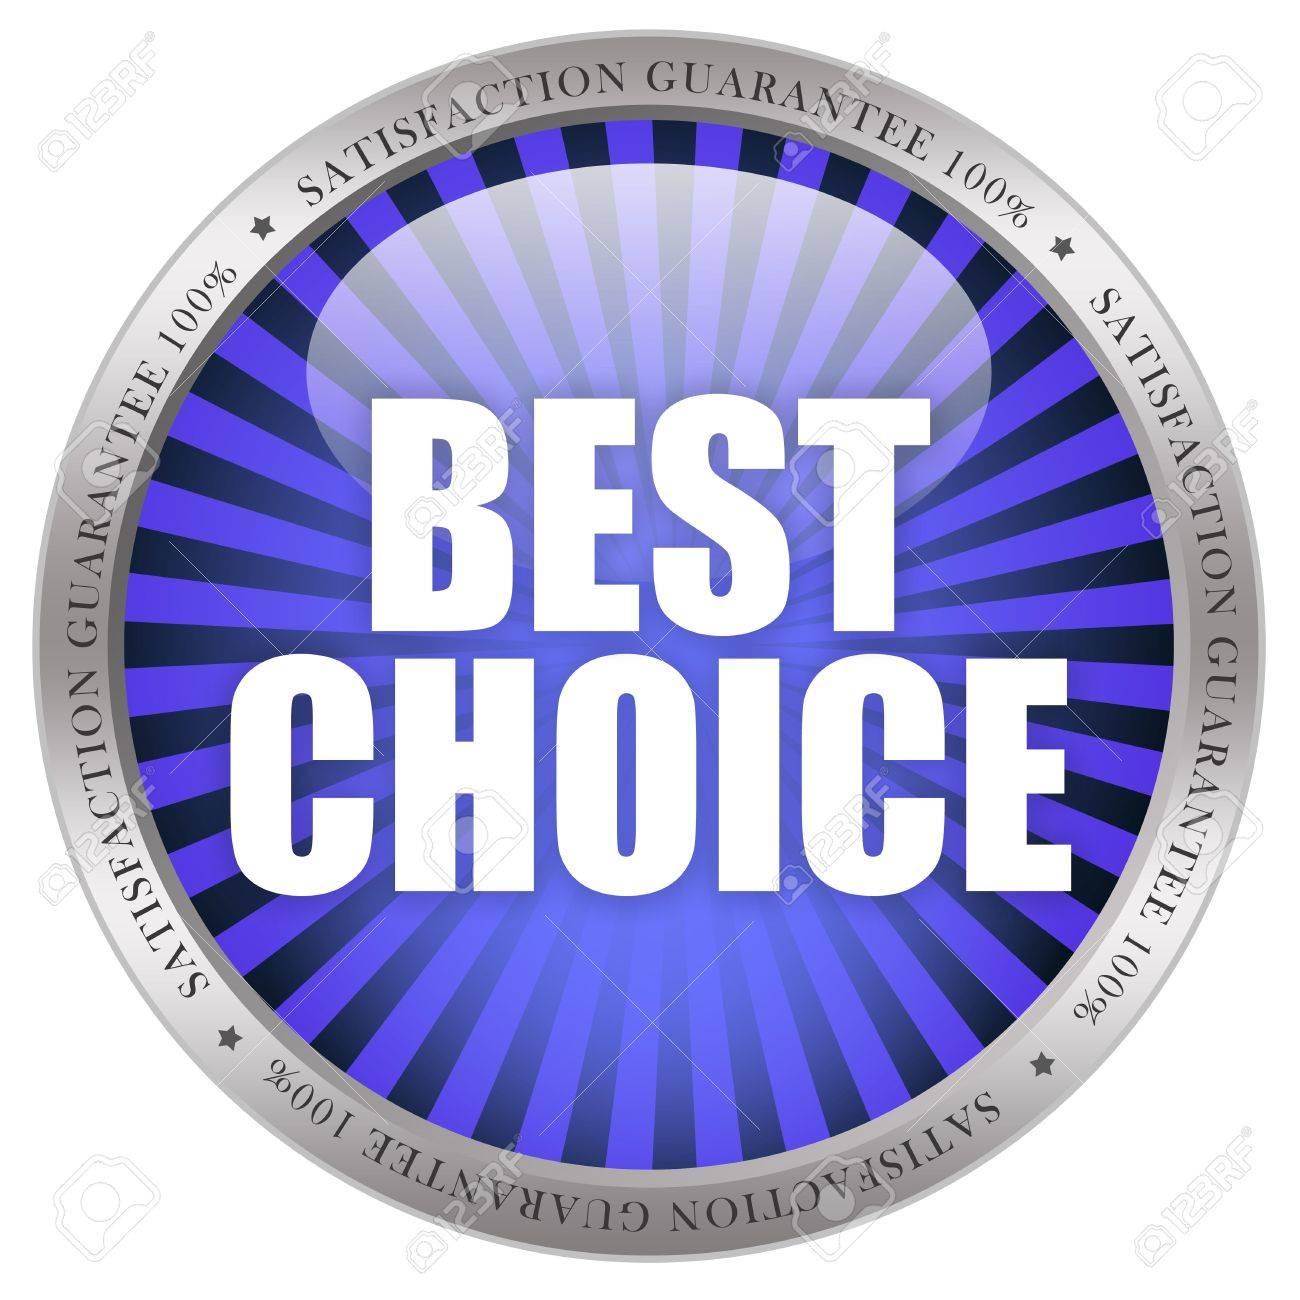 Best choice icon Stock Photo - 8222776